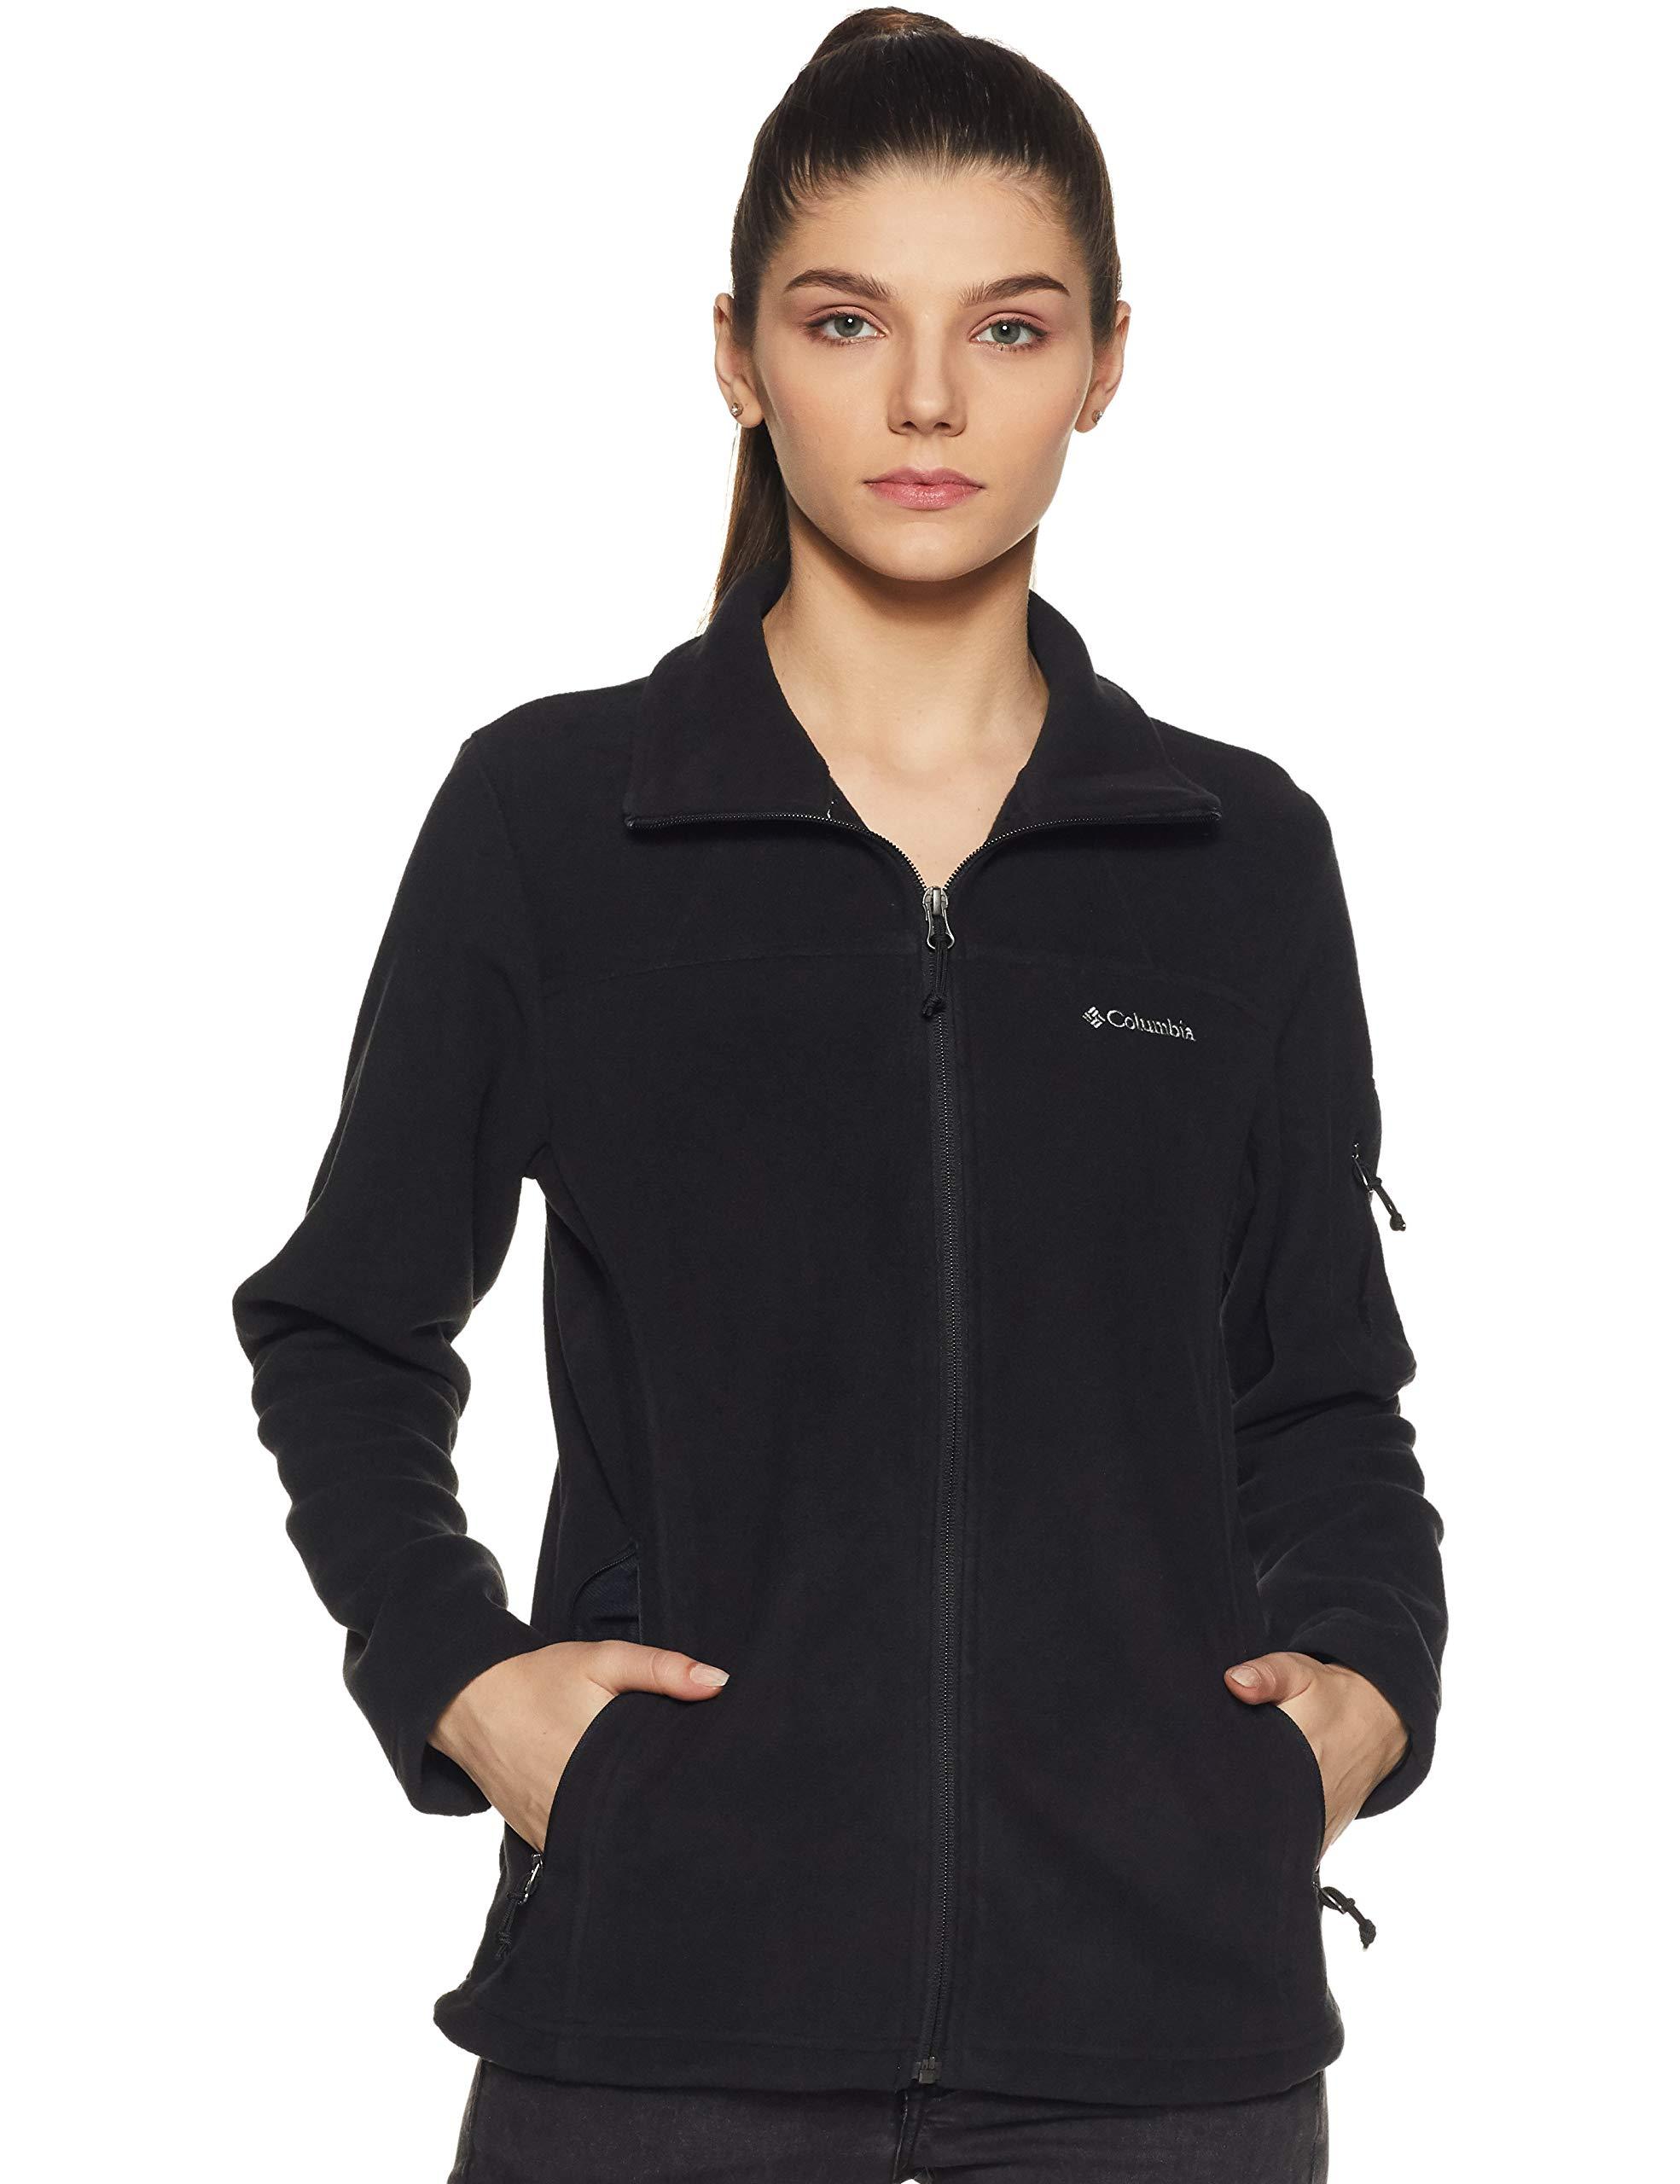 Columbia Women's Fast Trek II Full Zip Soft Fleece Jacket, Black, Large by Columbia